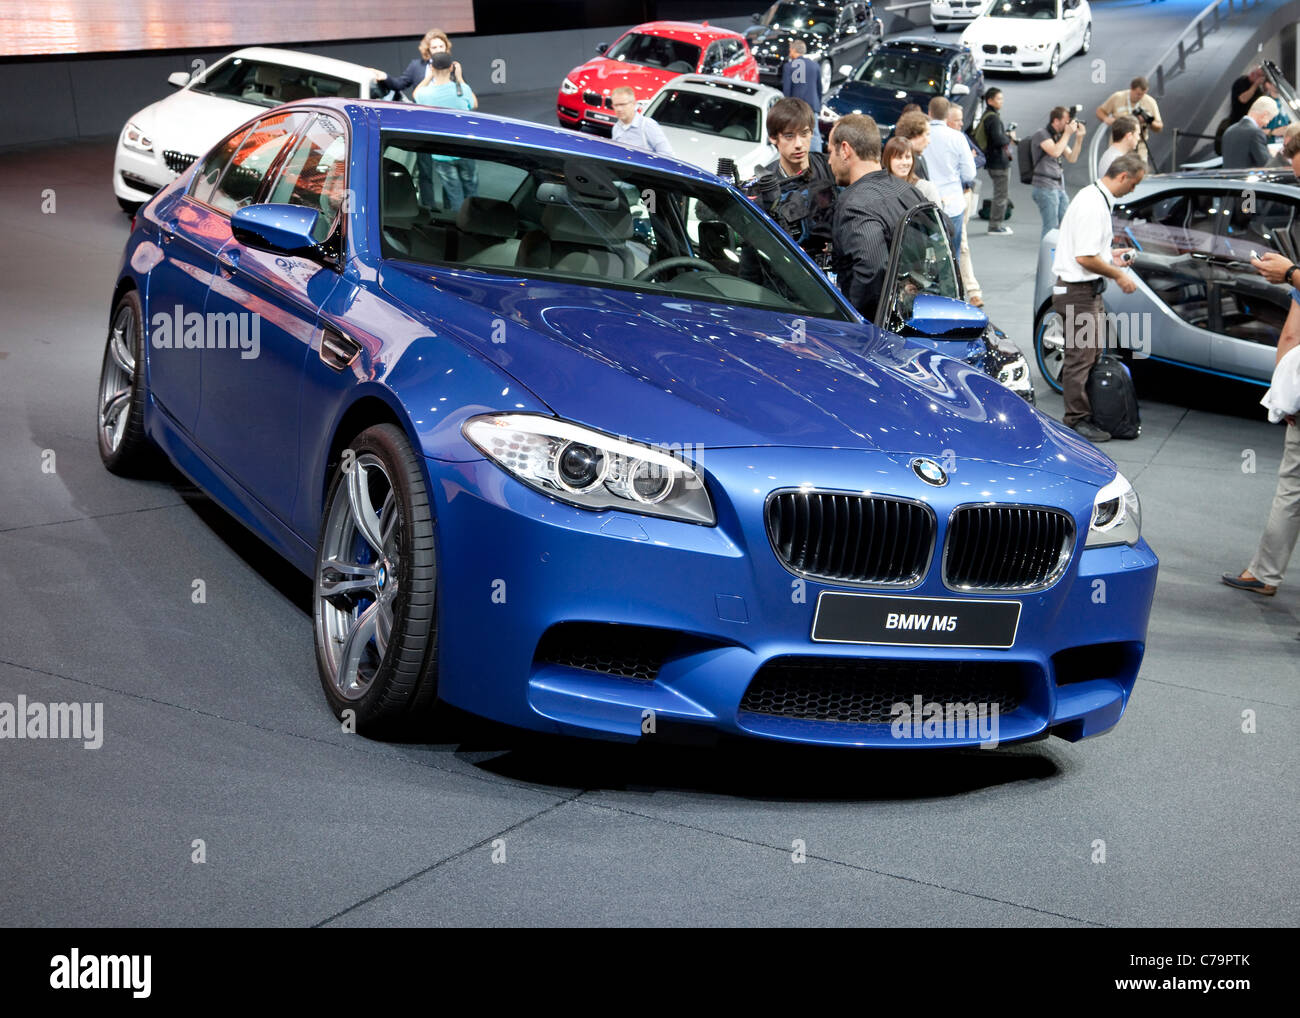 New BMW M5 on the IAA 2011 International Motor Show in Frankfurt am Main, Germany - Stock Image